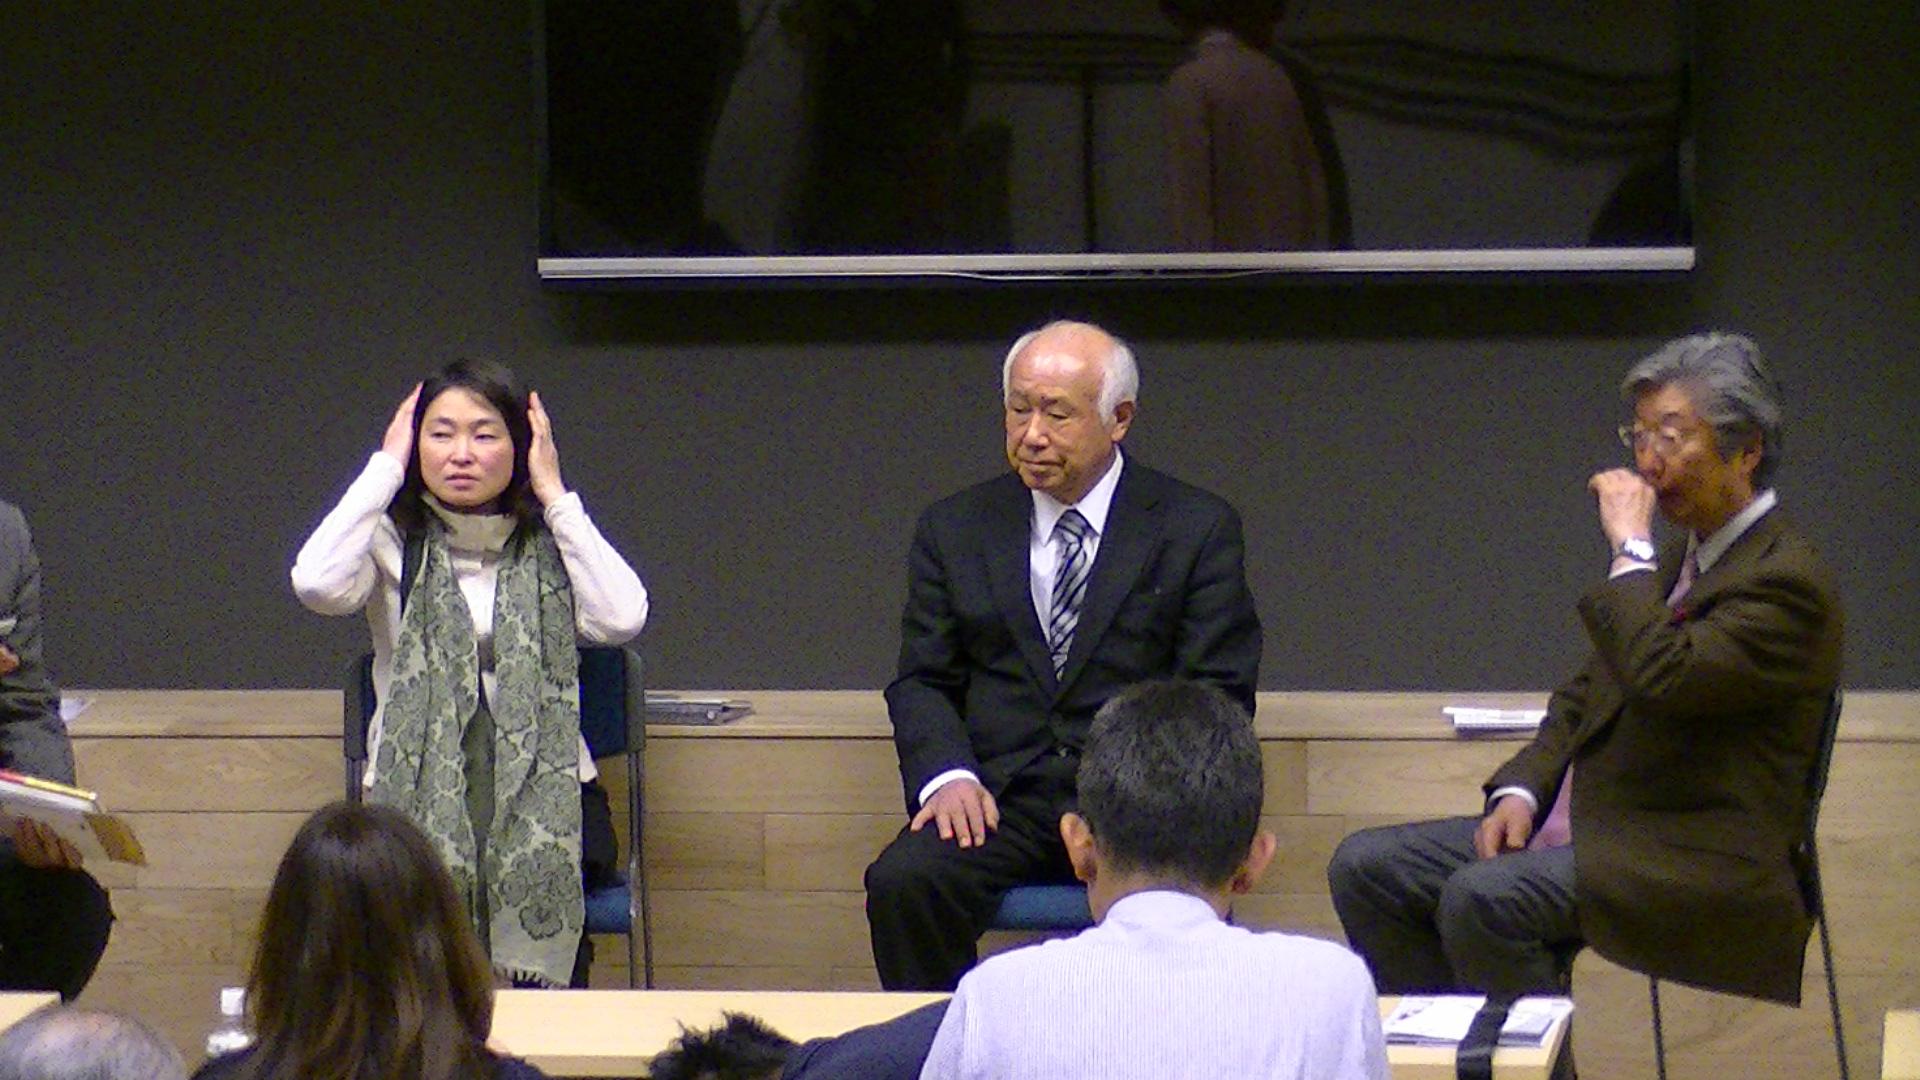 PIC 0543 - 4月1日東京思風塾の開催になります。